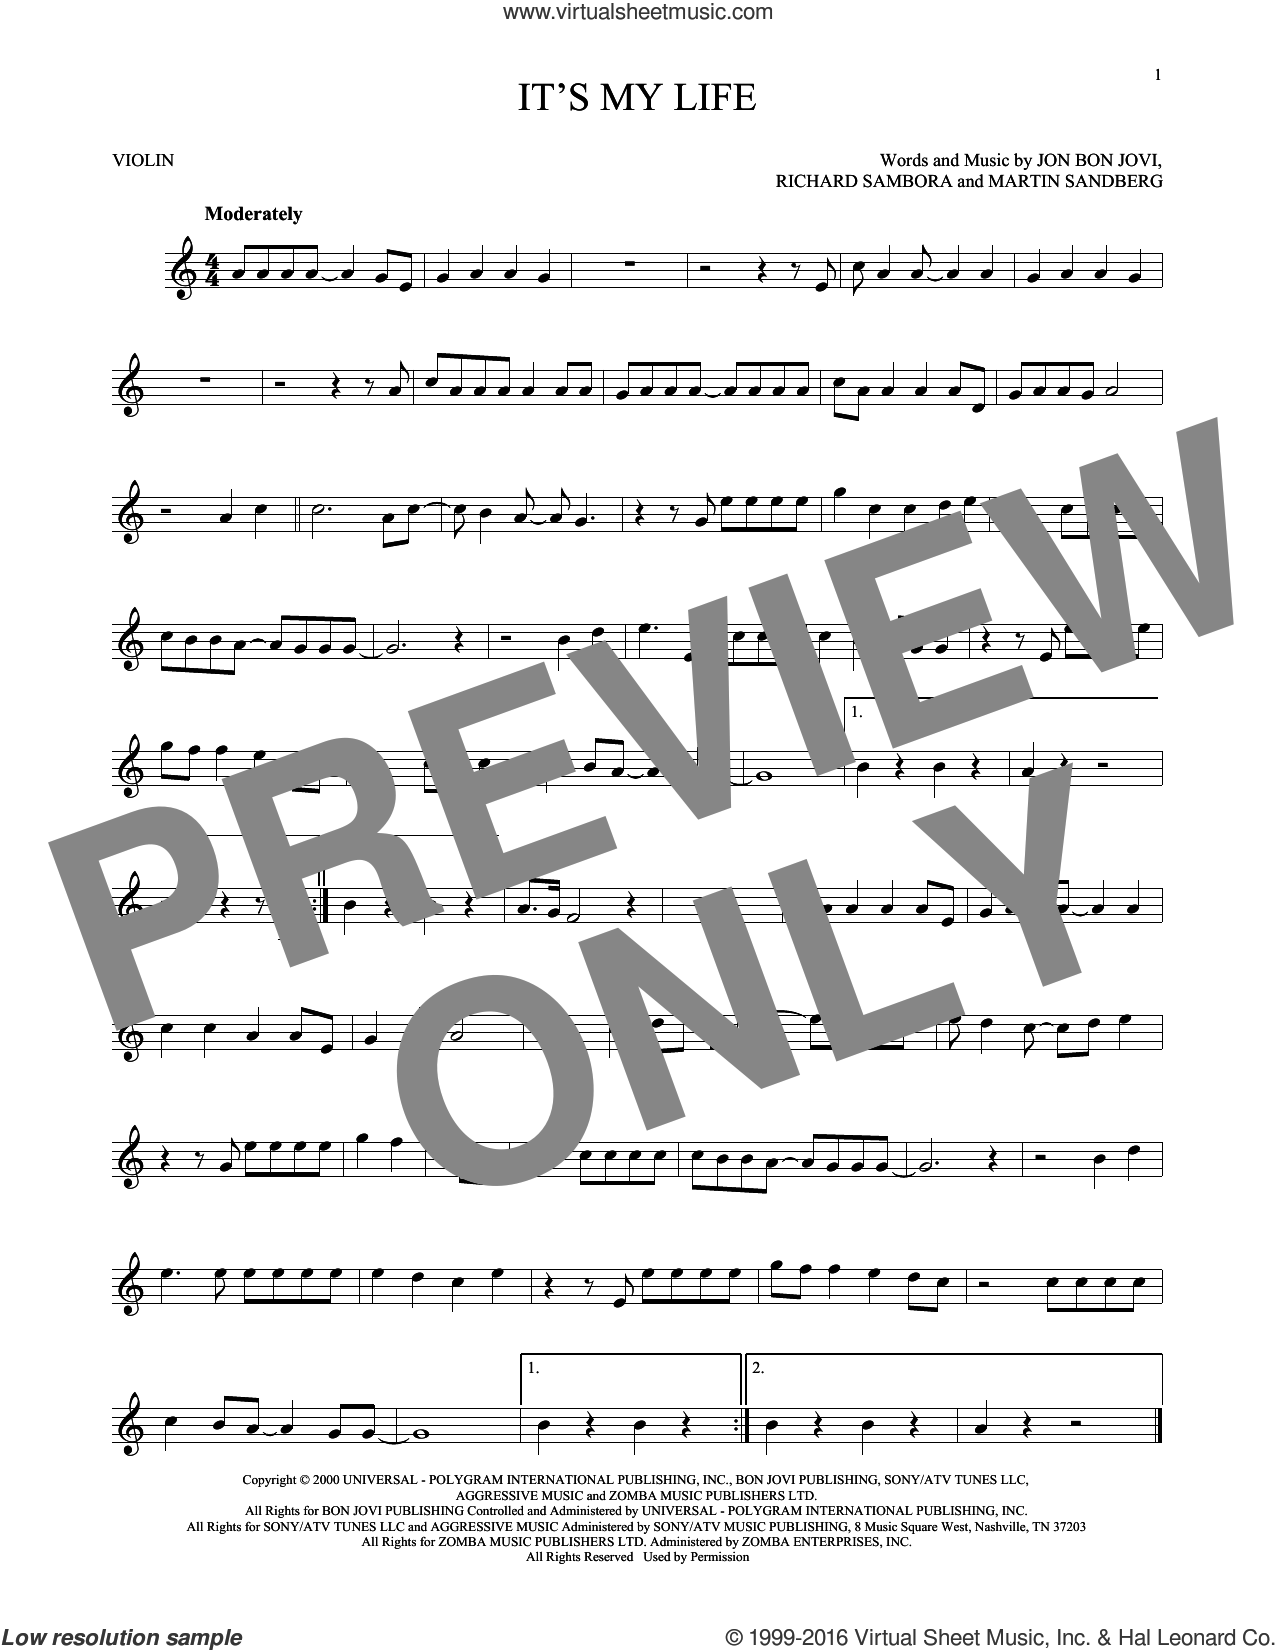 It's My Life sheet music for violin solo by Bon Jovi, Martin Sandberg and Richie Sambora, intermediate skill level